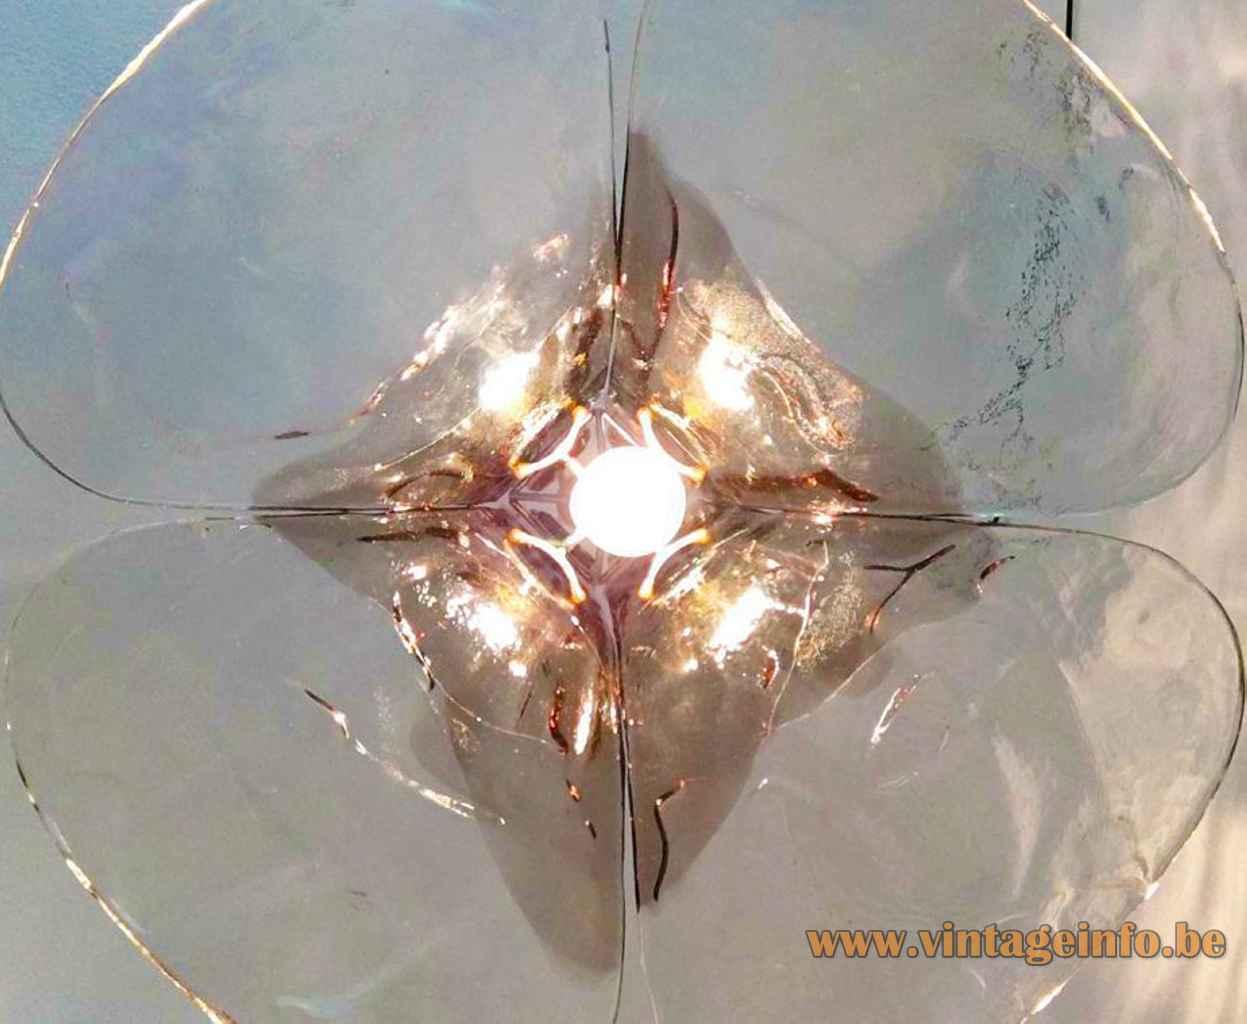 AV Mazzega LS 185 pendant lamp 4 smoked glass leaves lampshade inside view Murano Italy